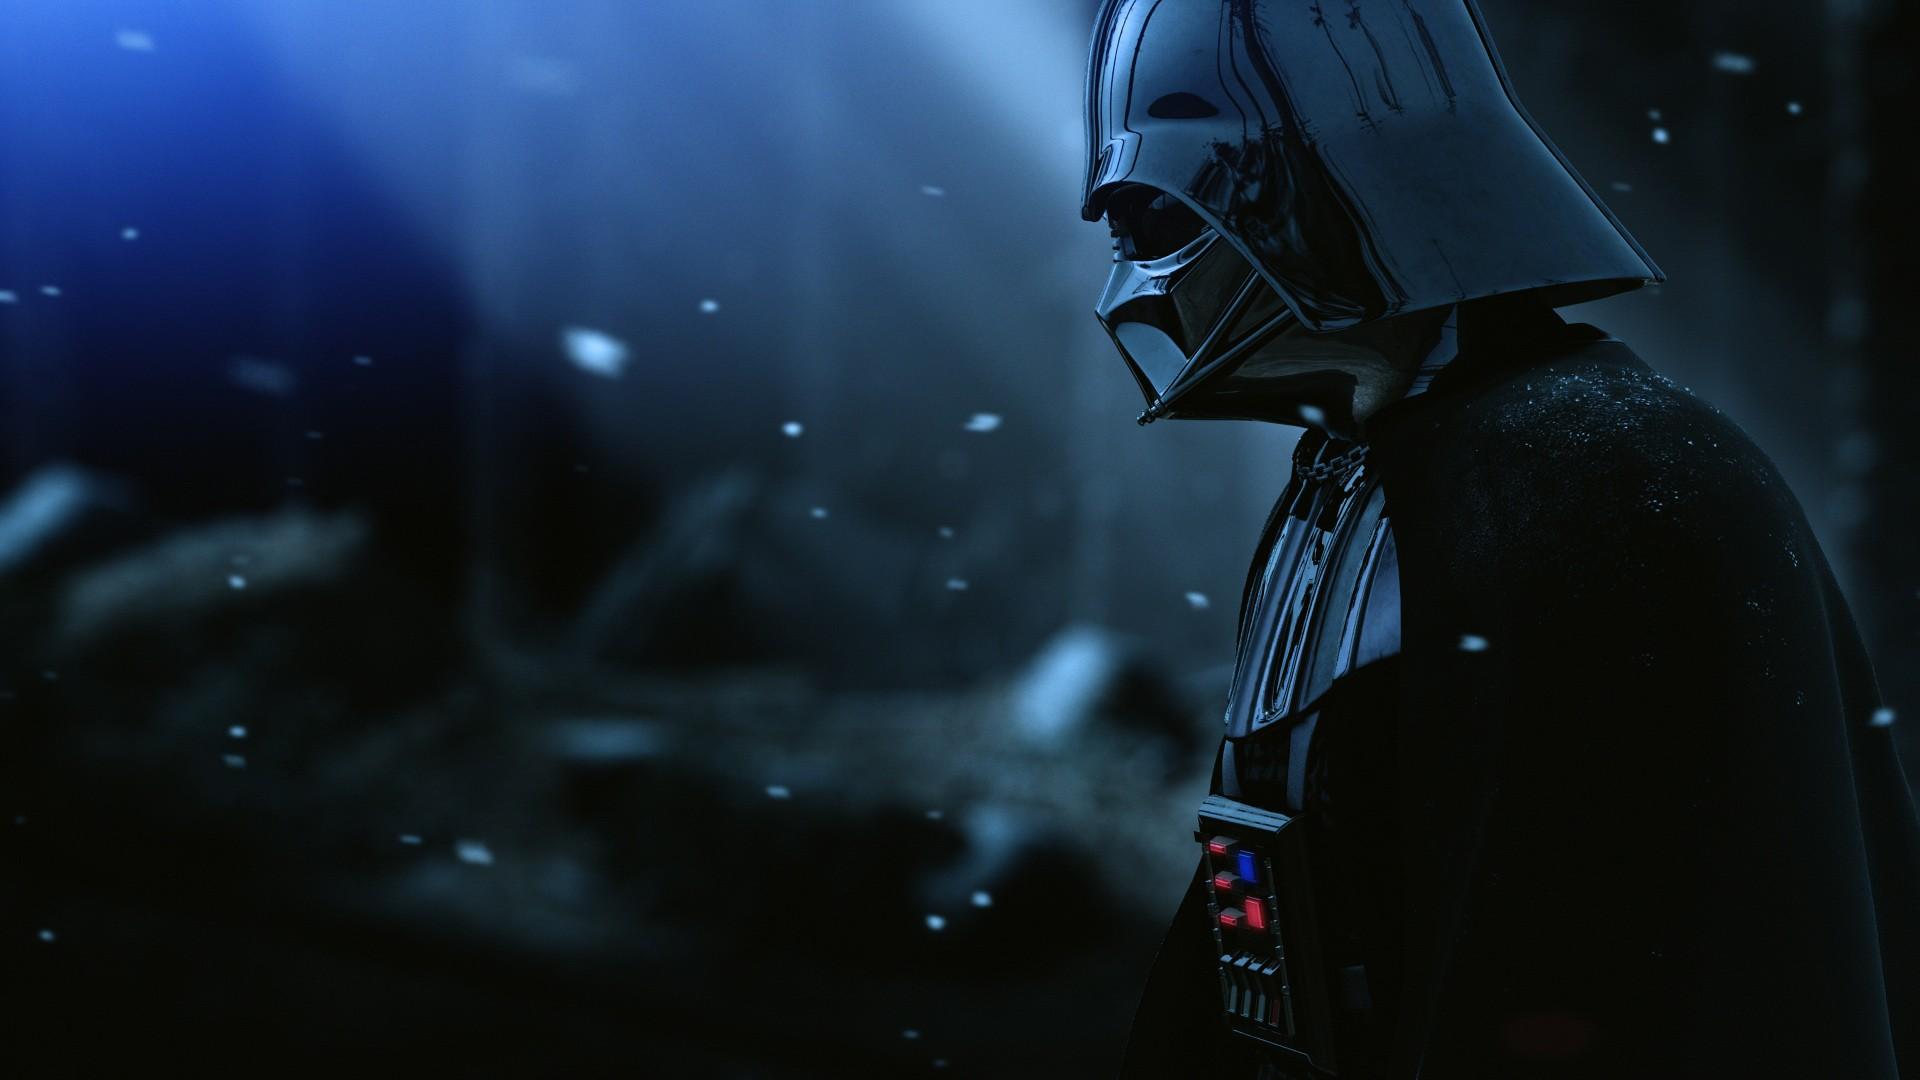 Star Wars HD Wallpapers Download Wallpaper Wallpaper High 1920x1080